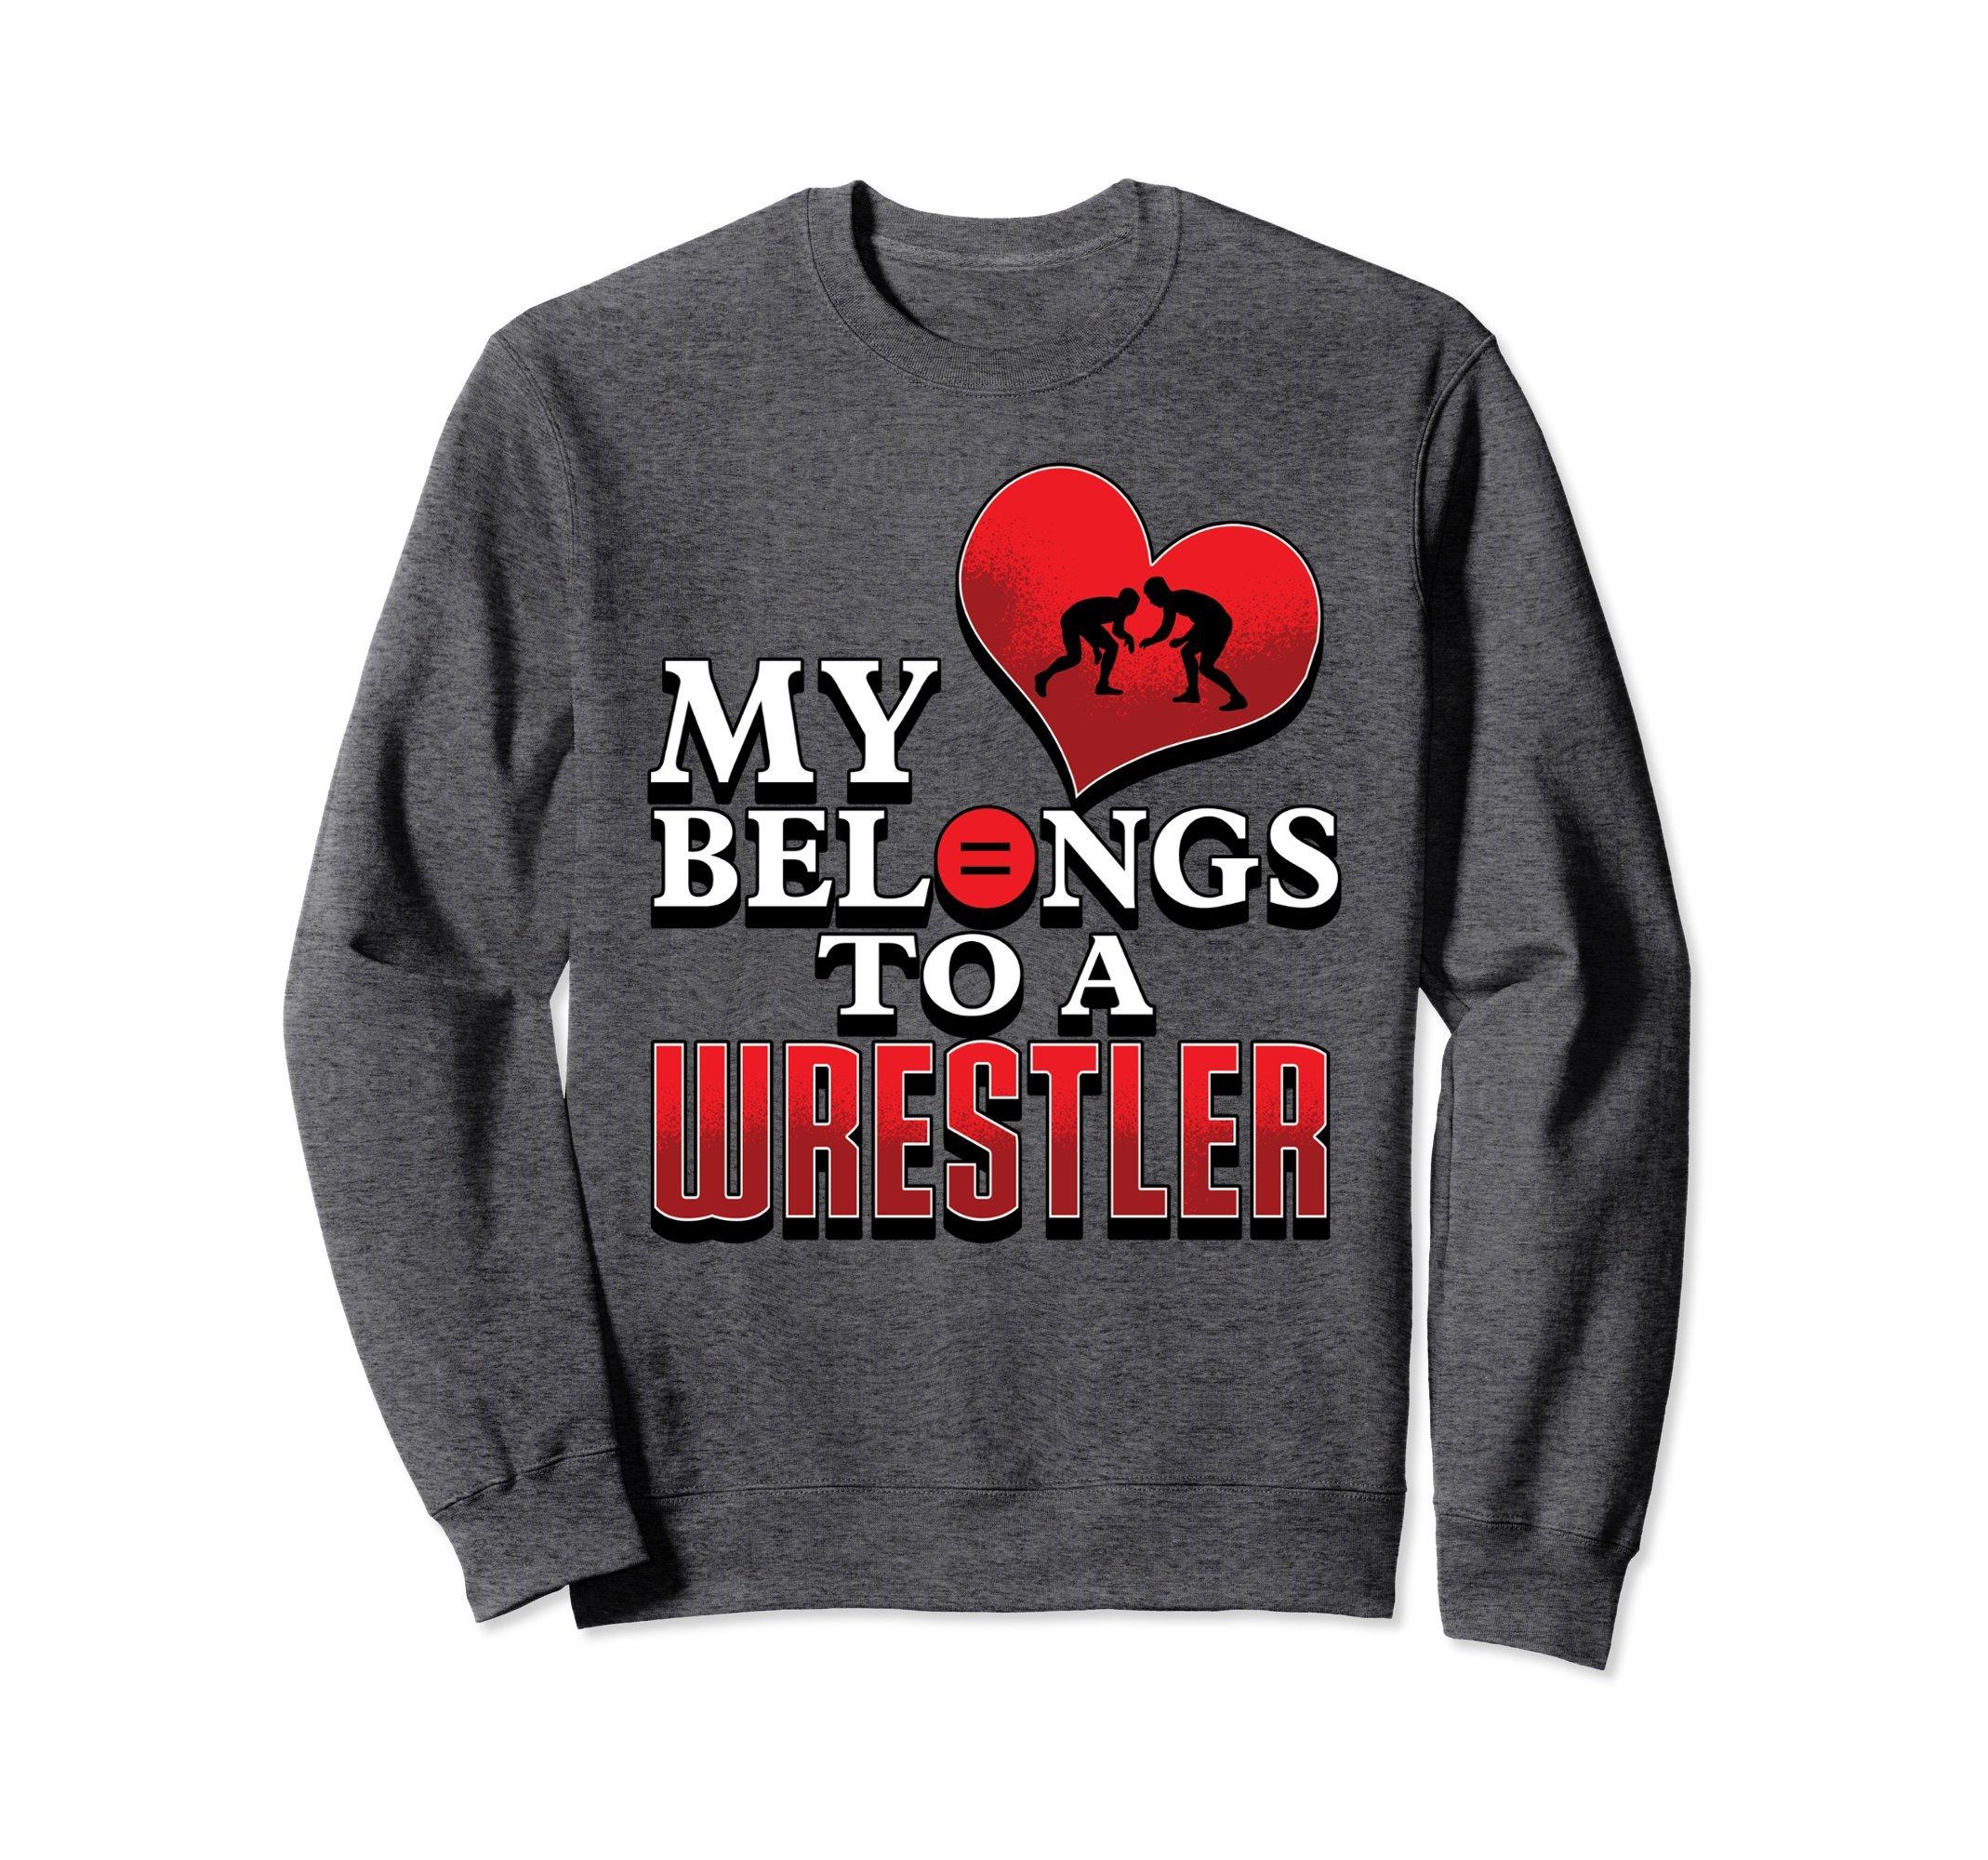 Unisex Wrestling Sweatshirt- My Heart Belongs to a Wrestler Sweater XL: Dark Heather